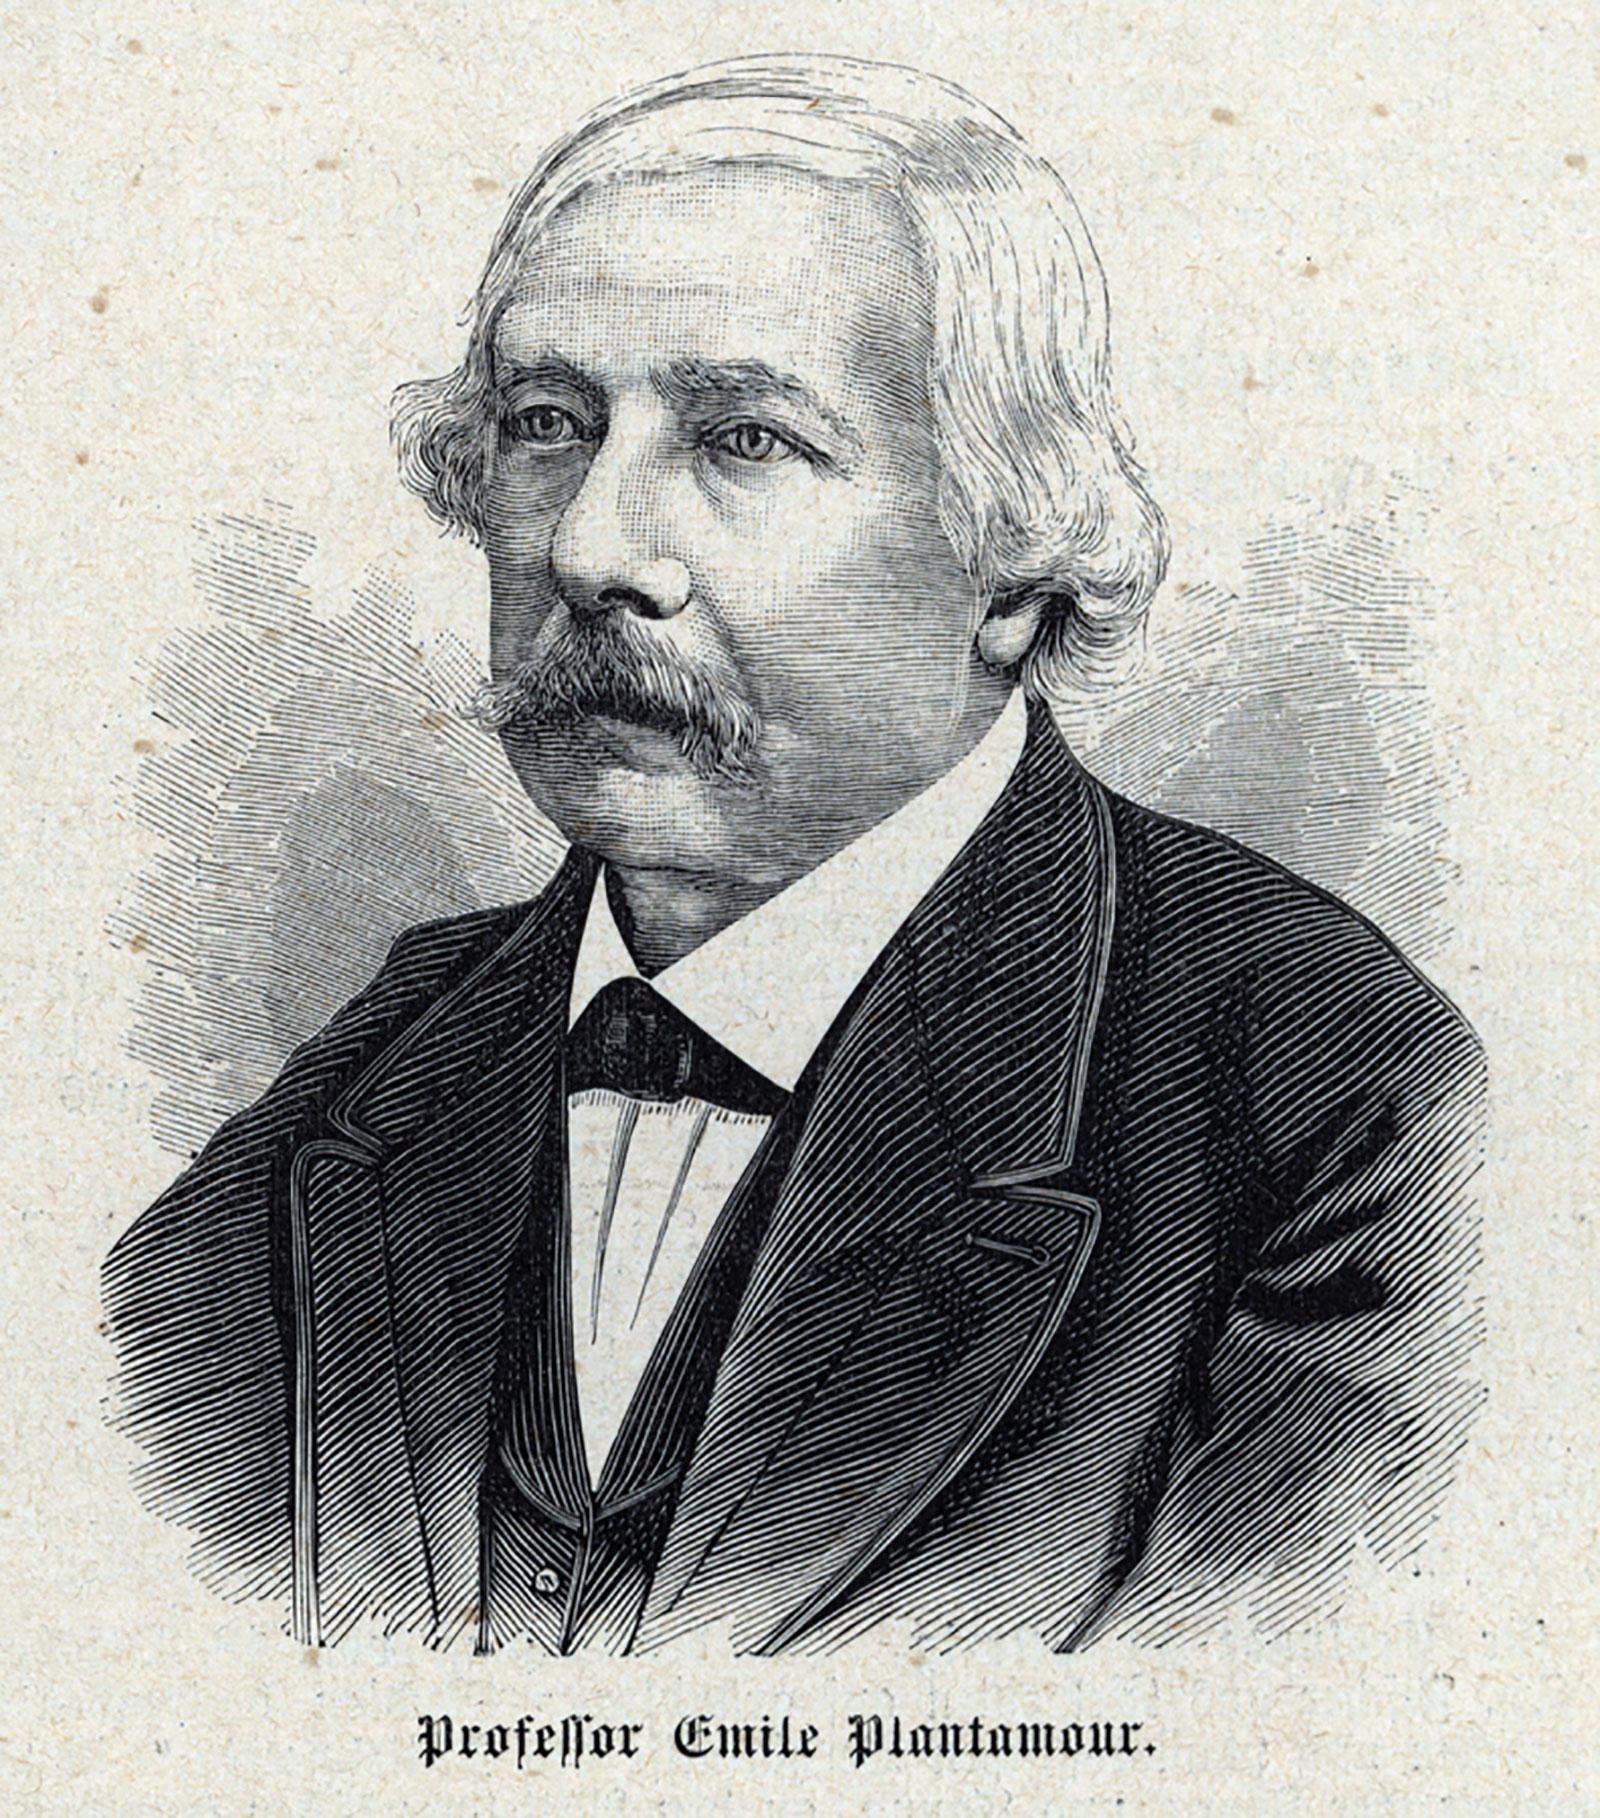 Prof Emile Plantamour